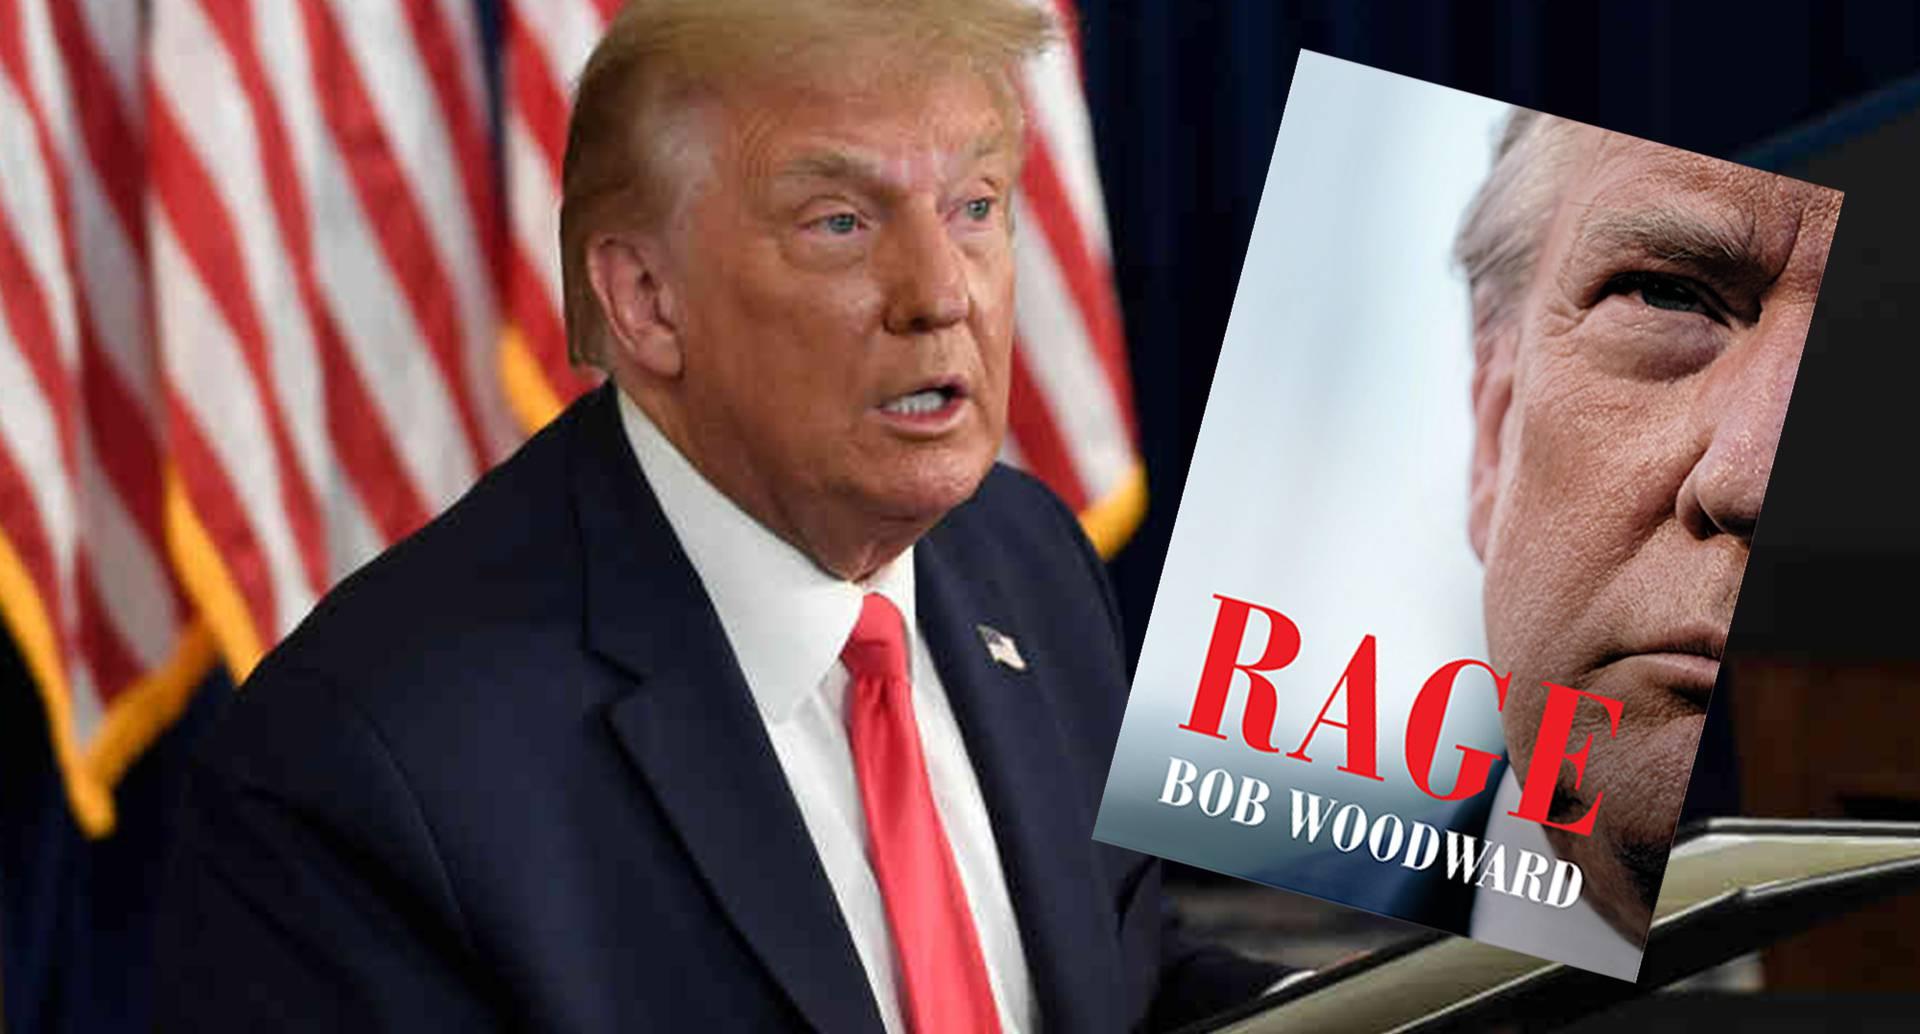 Rage de Bob Woodward